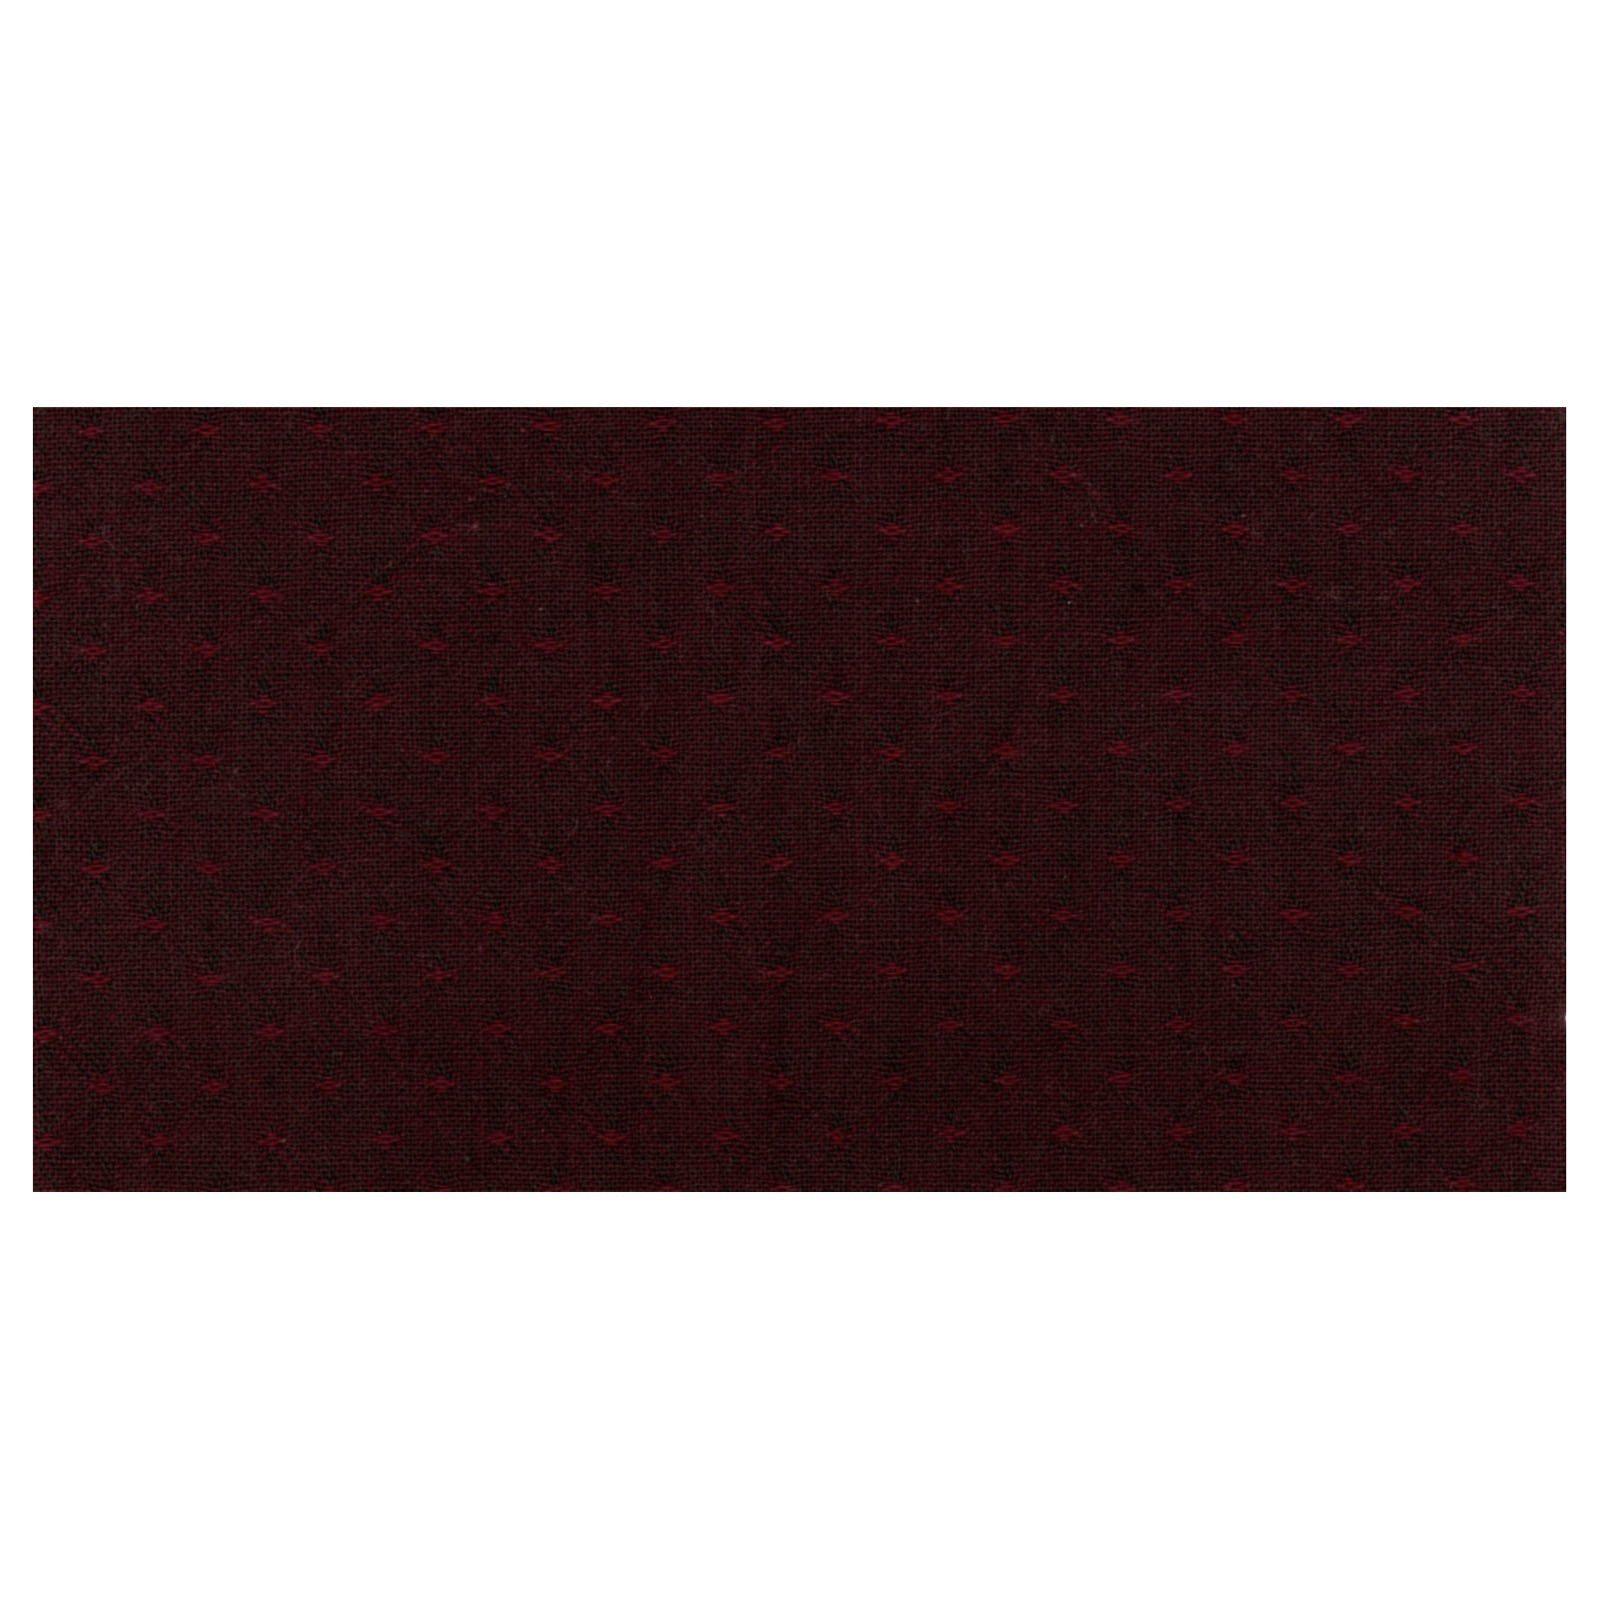 EESMY63066S-C Calm Yarn Dye!